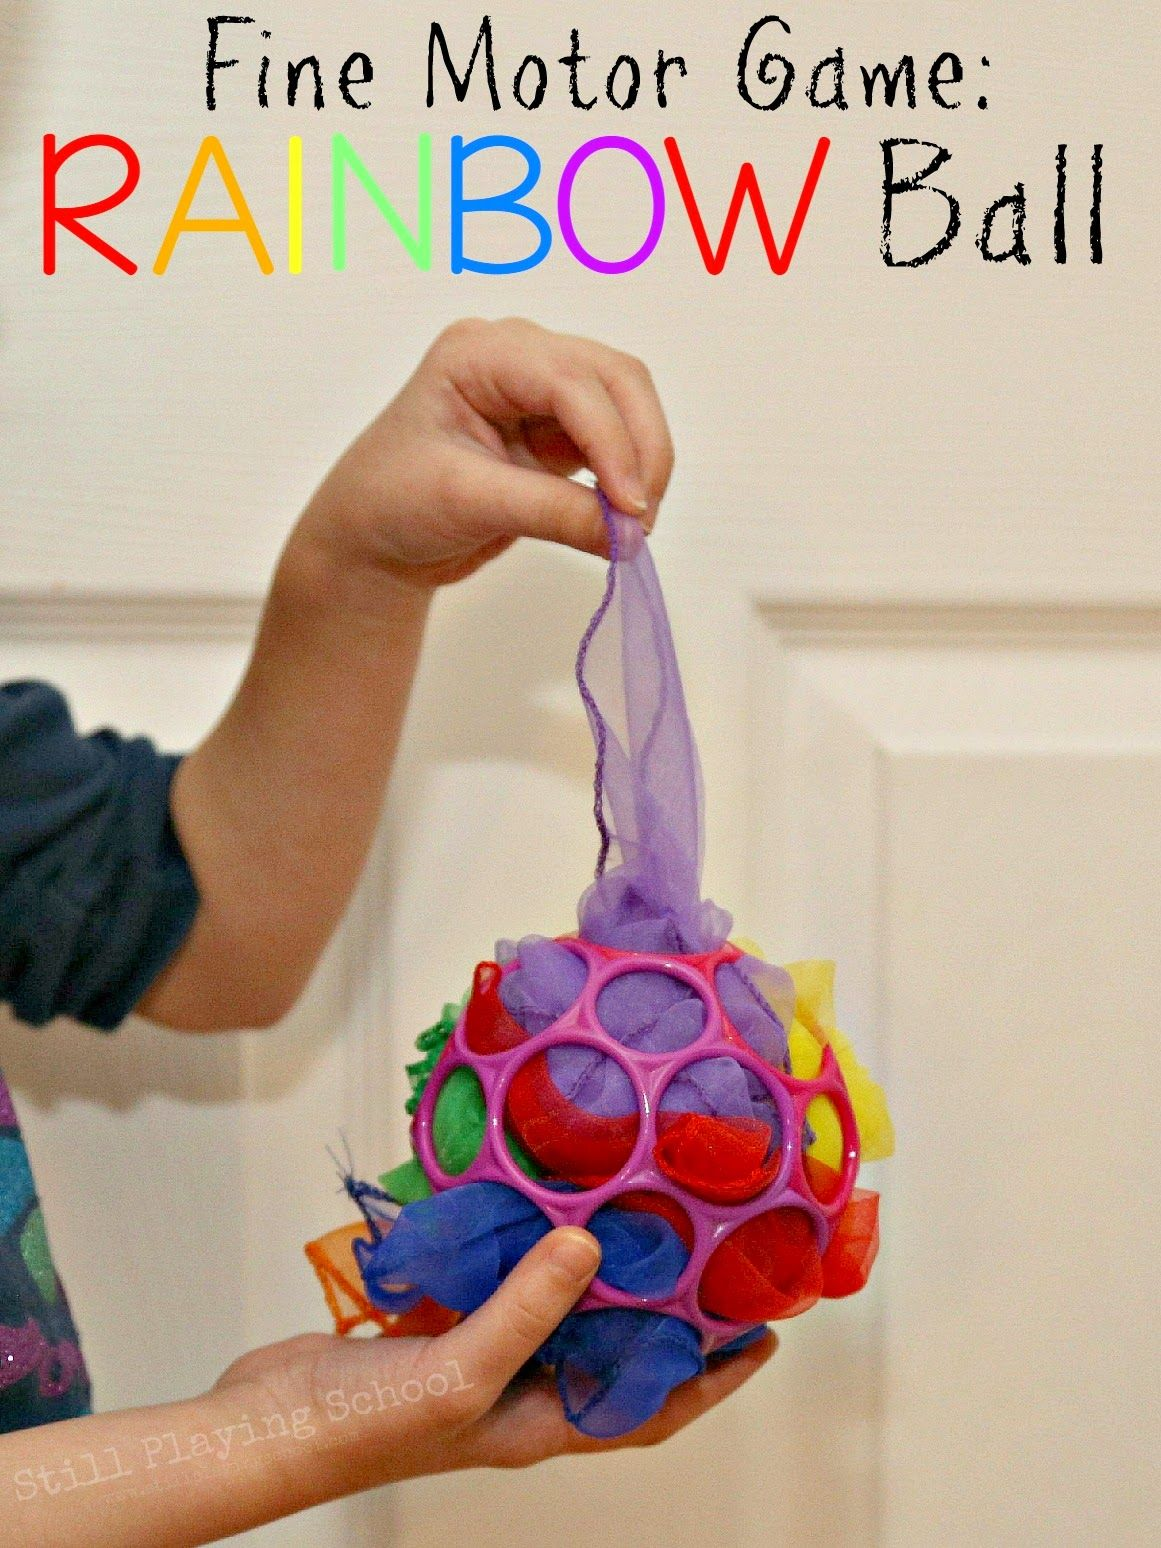 Fine Motor Rainbow Ball Game Infant activities, Motor